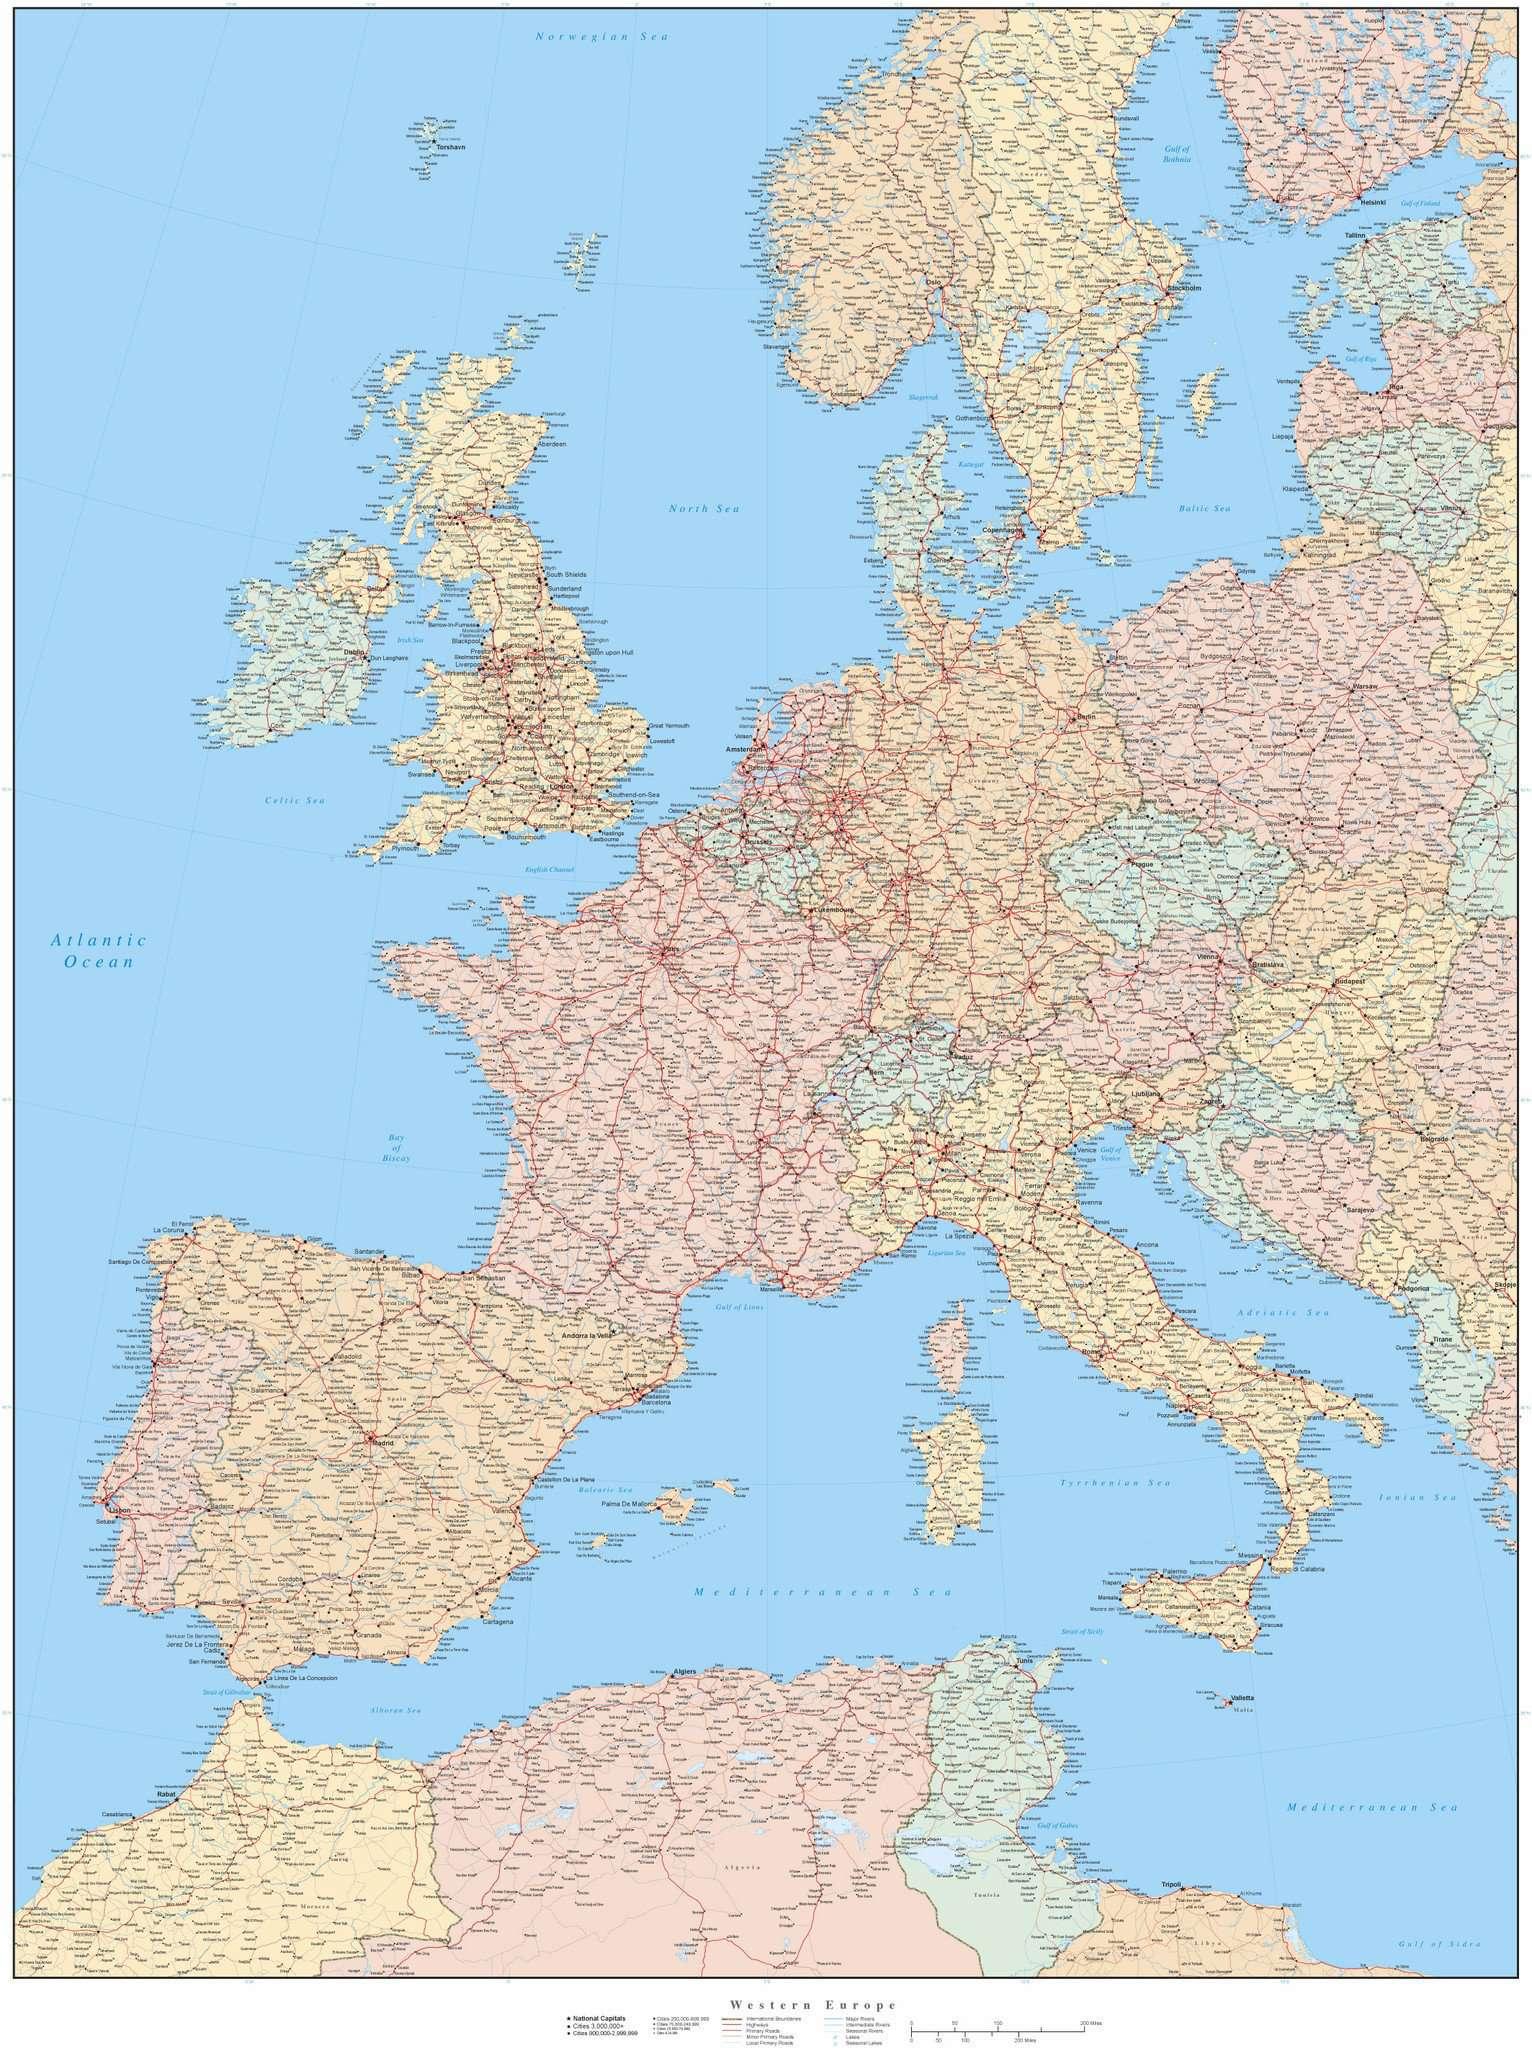 Western Europe Map In Adobe Illustrator Vector Format